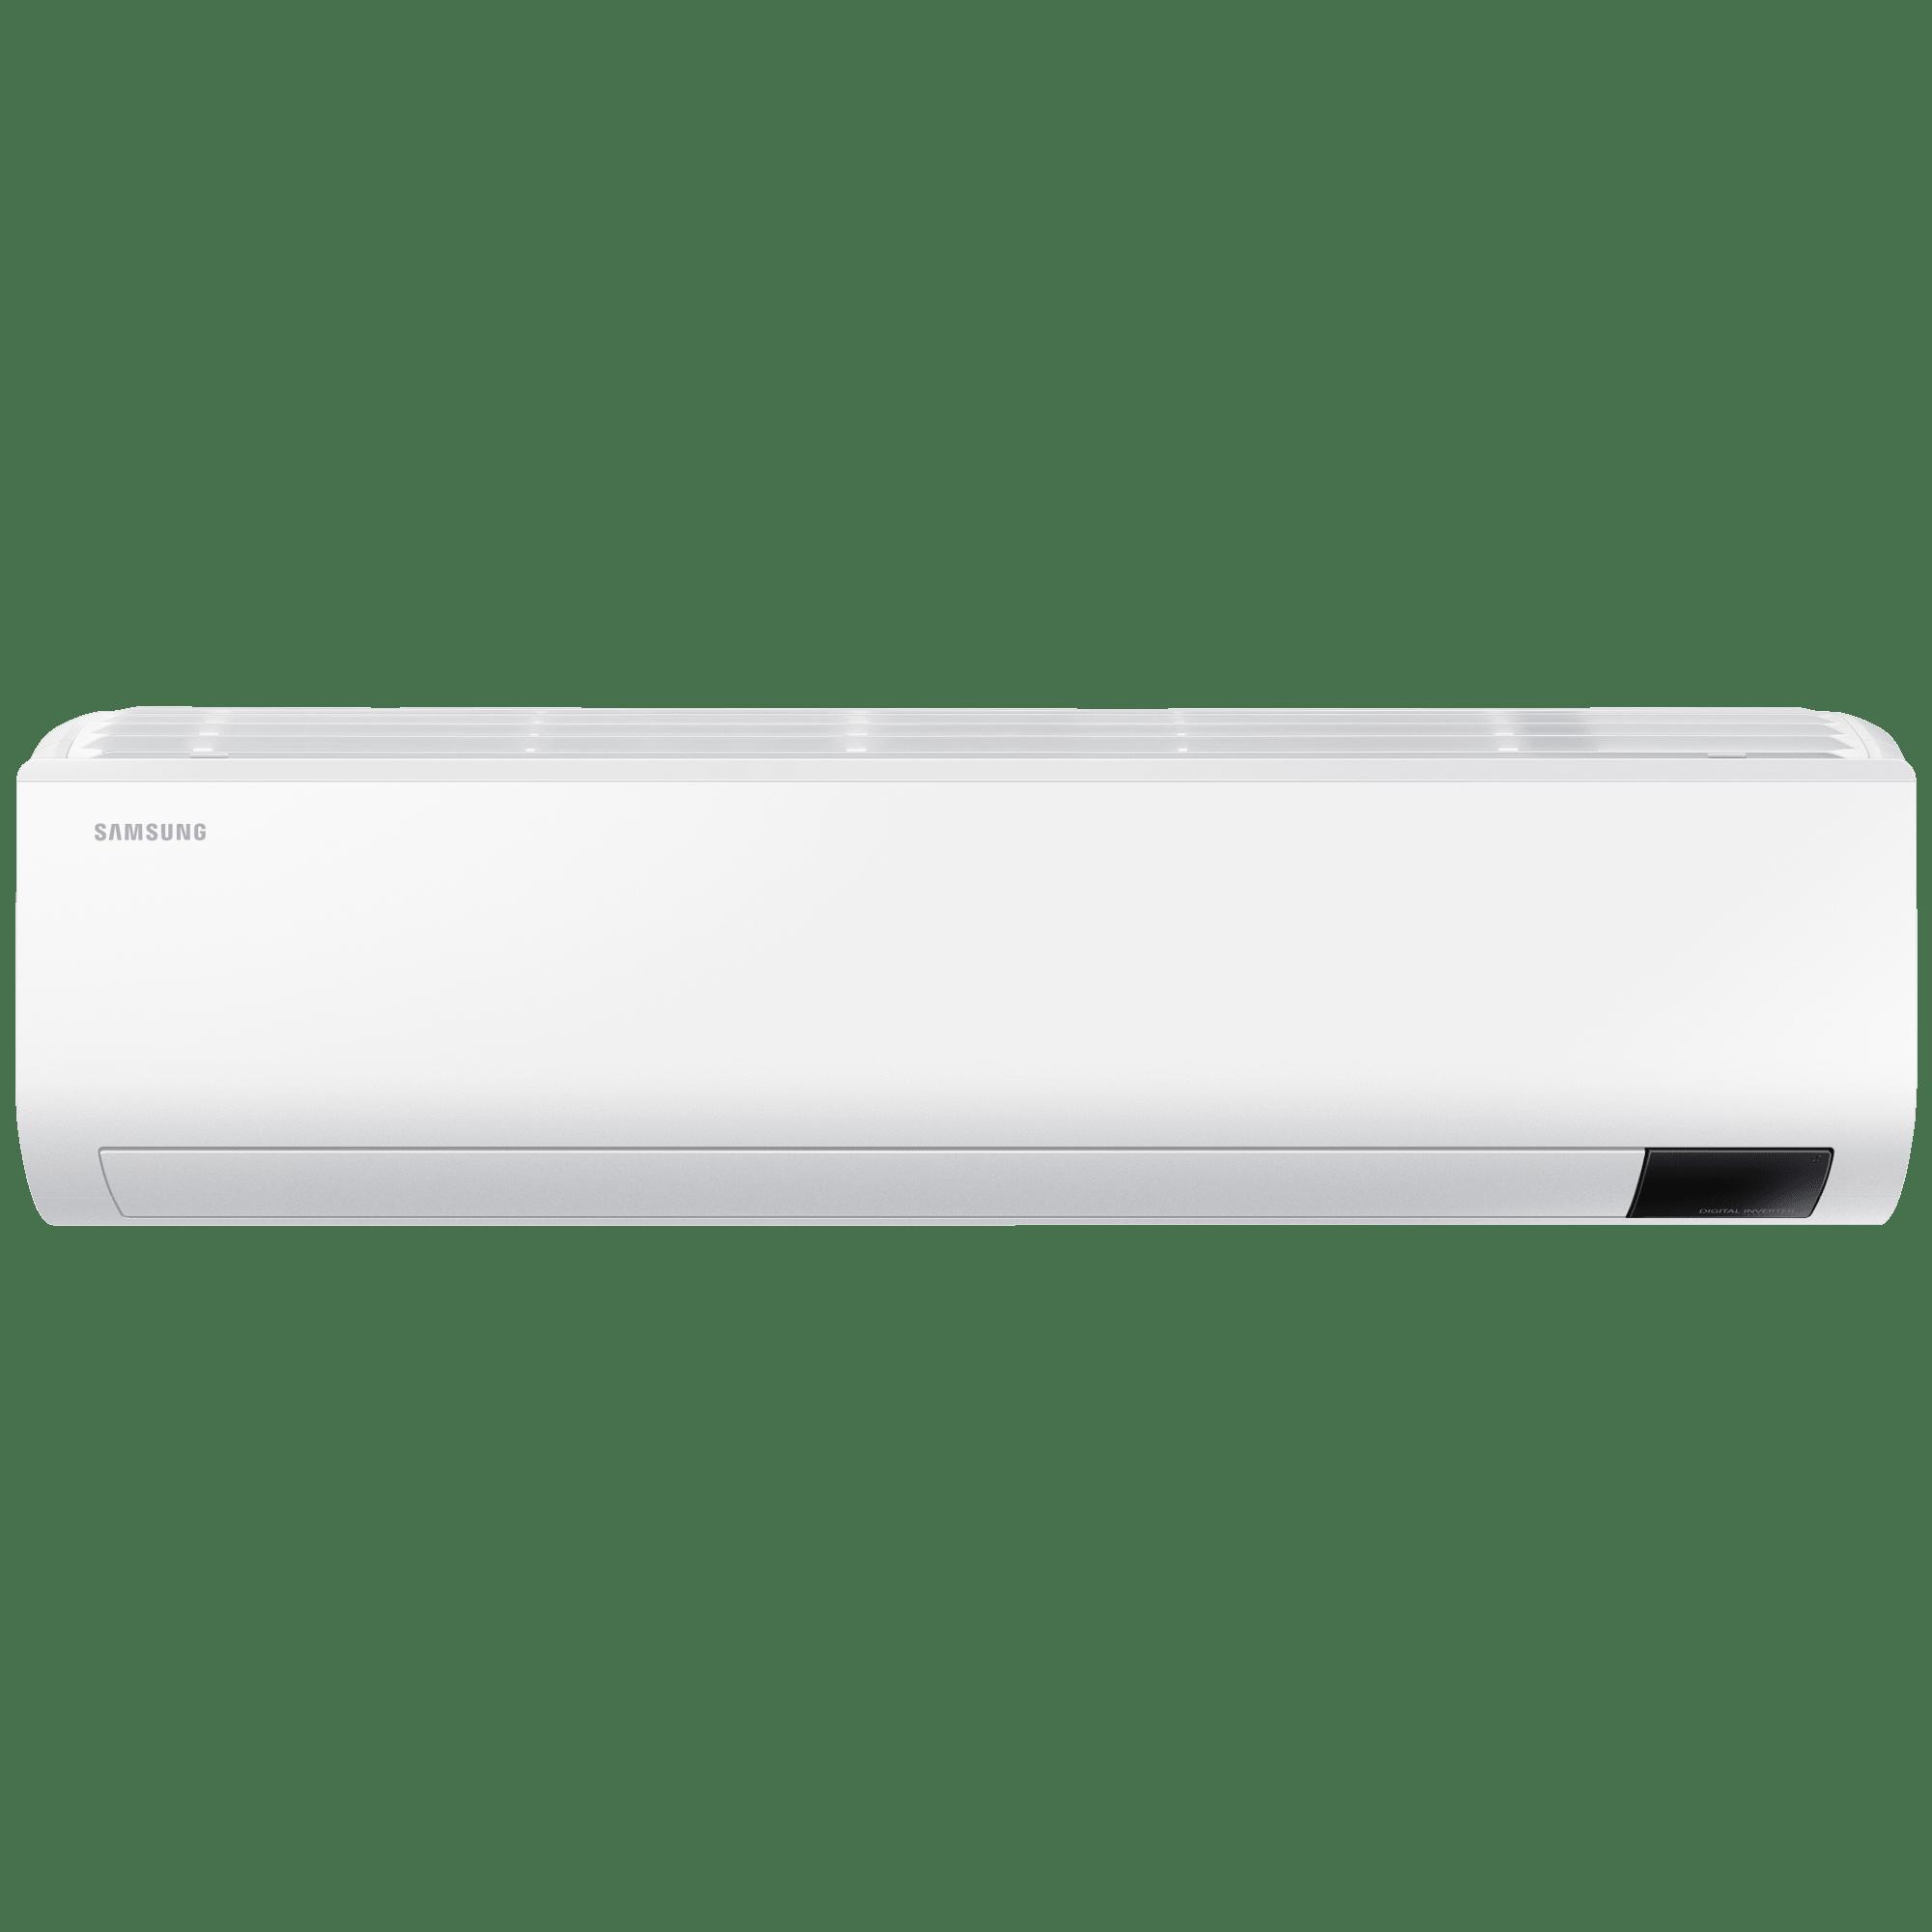 Samsung Airise 1.5 Ton 5 Star Inverter Split AC (Copper Condenser, AR18AY5ZAWK, Deco Wk (DA White))